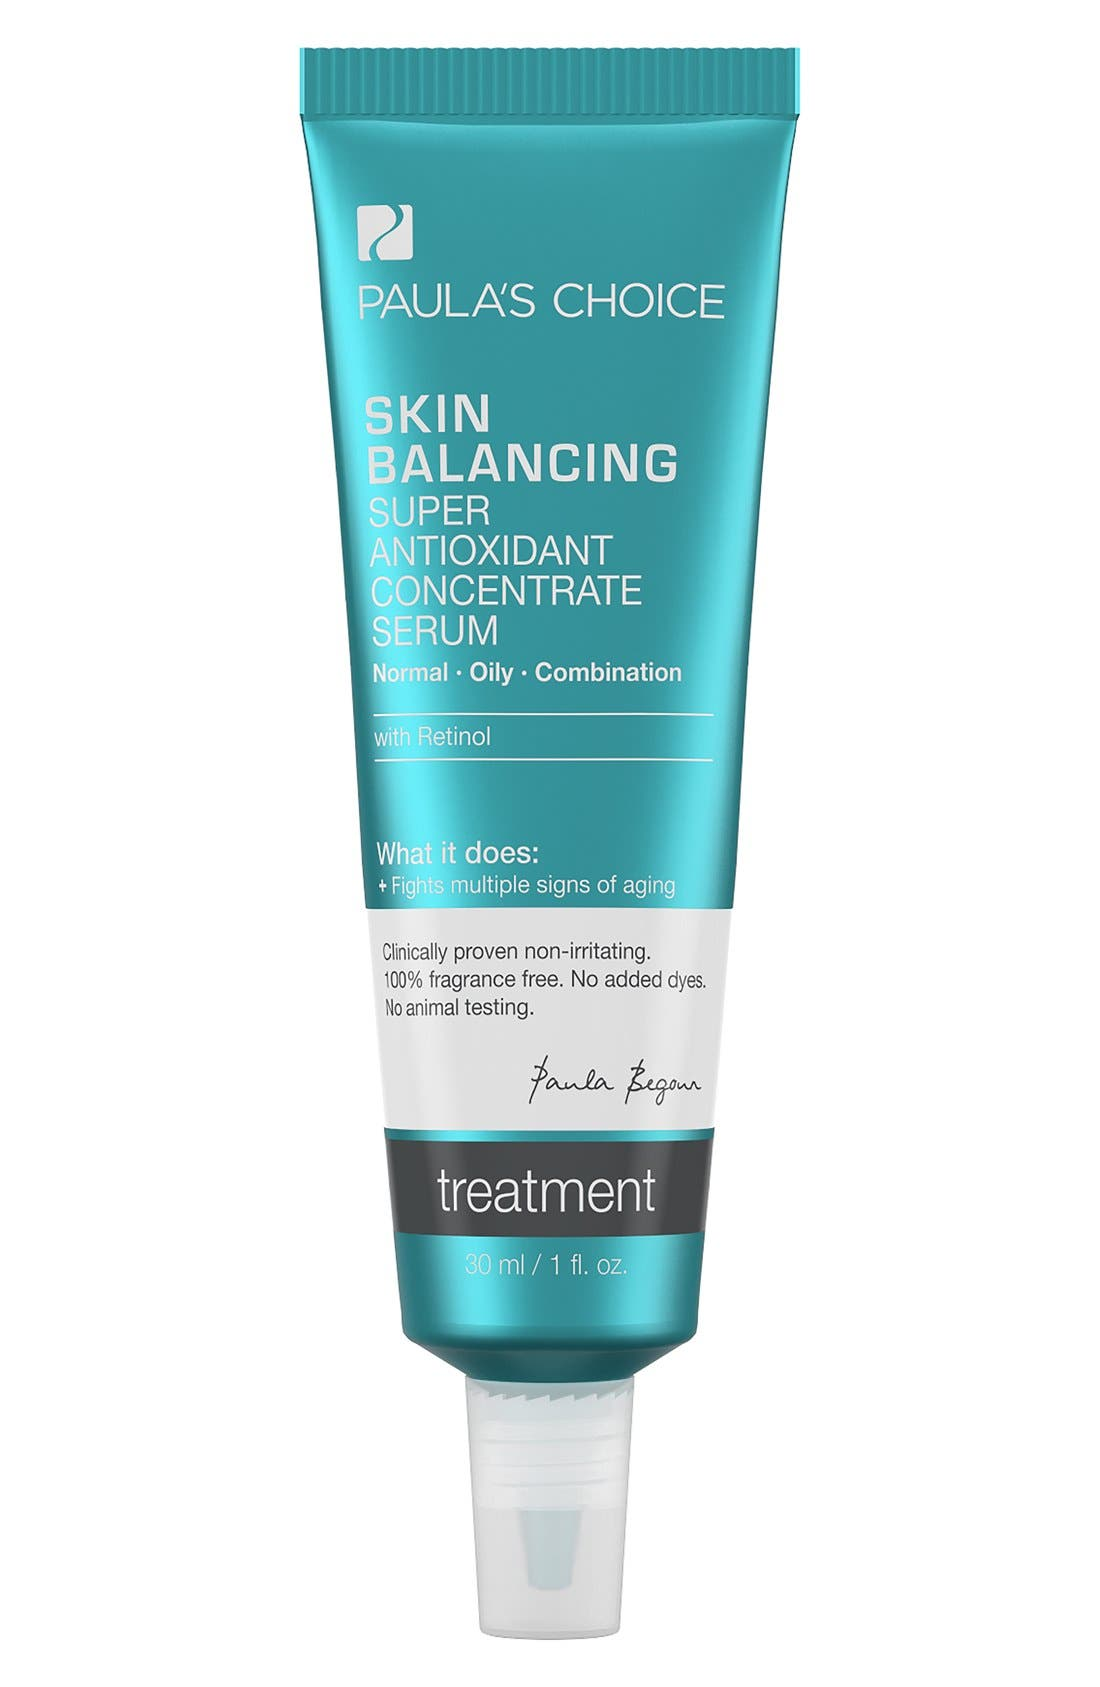 Skin Balancing Super Antioxidant Concentrate Serum with Retinol,                             Main thumbnail 1, color,                             NO COLOR